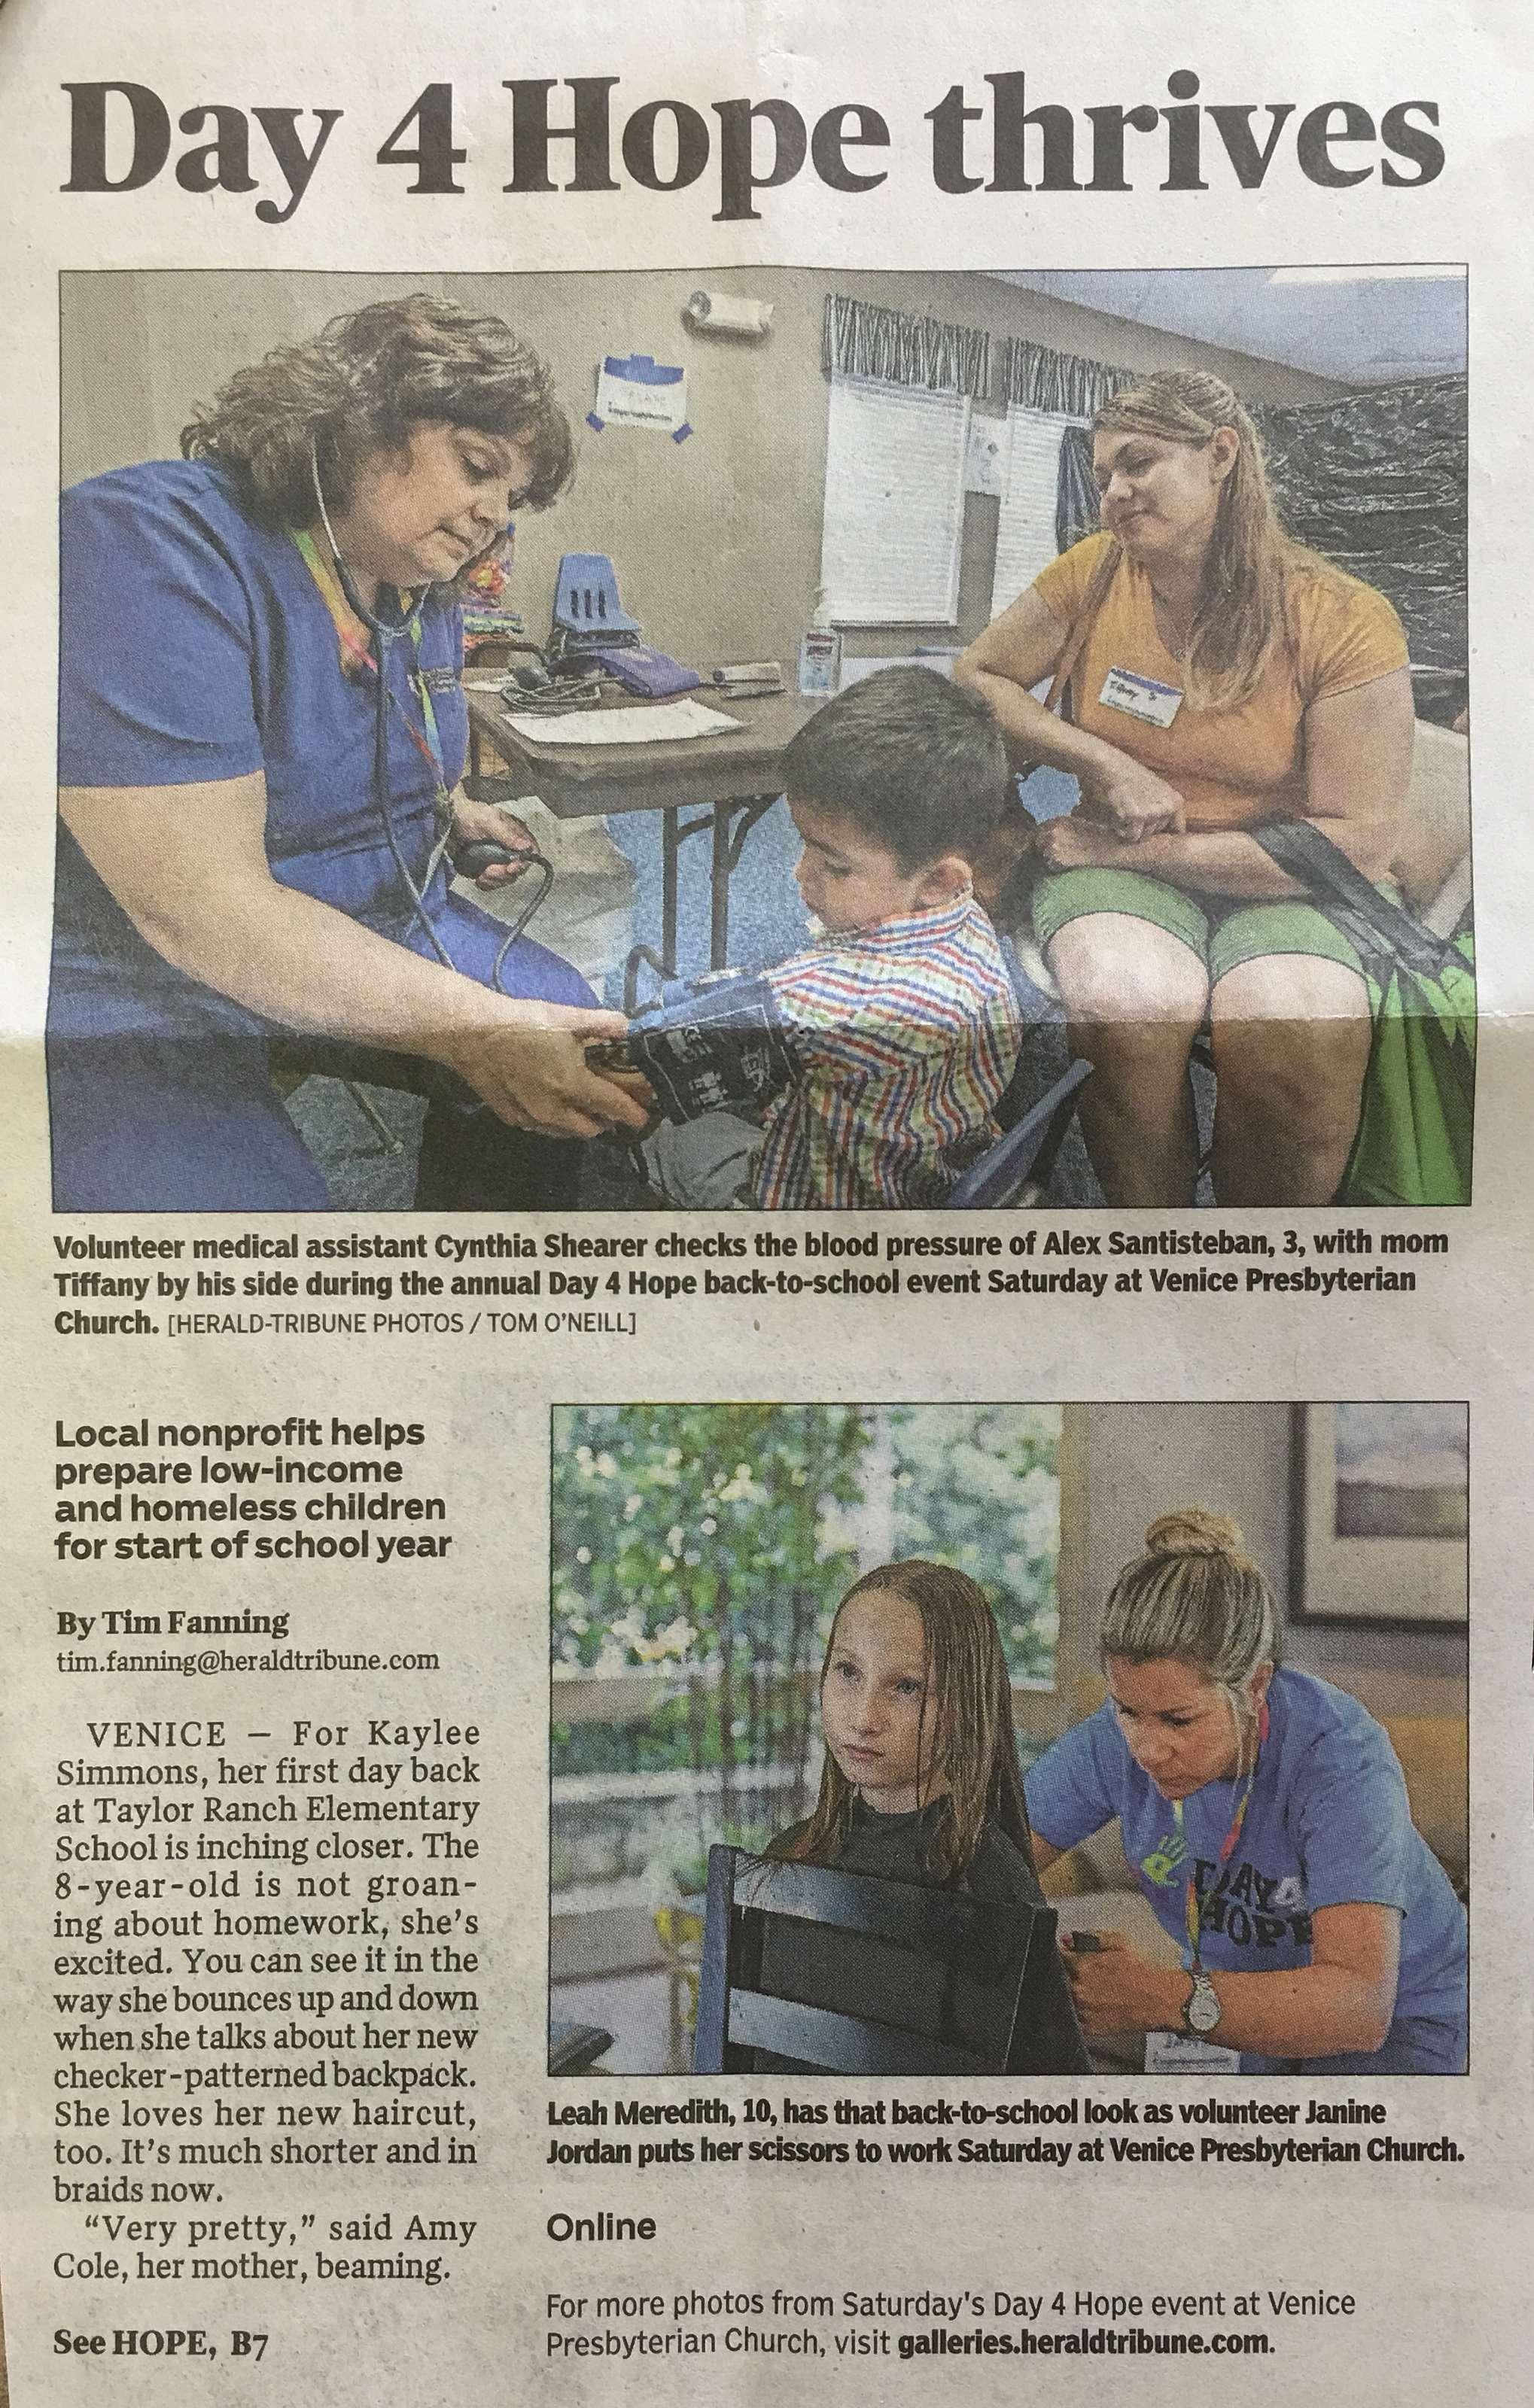 Article in the Herald Tribune, 2018